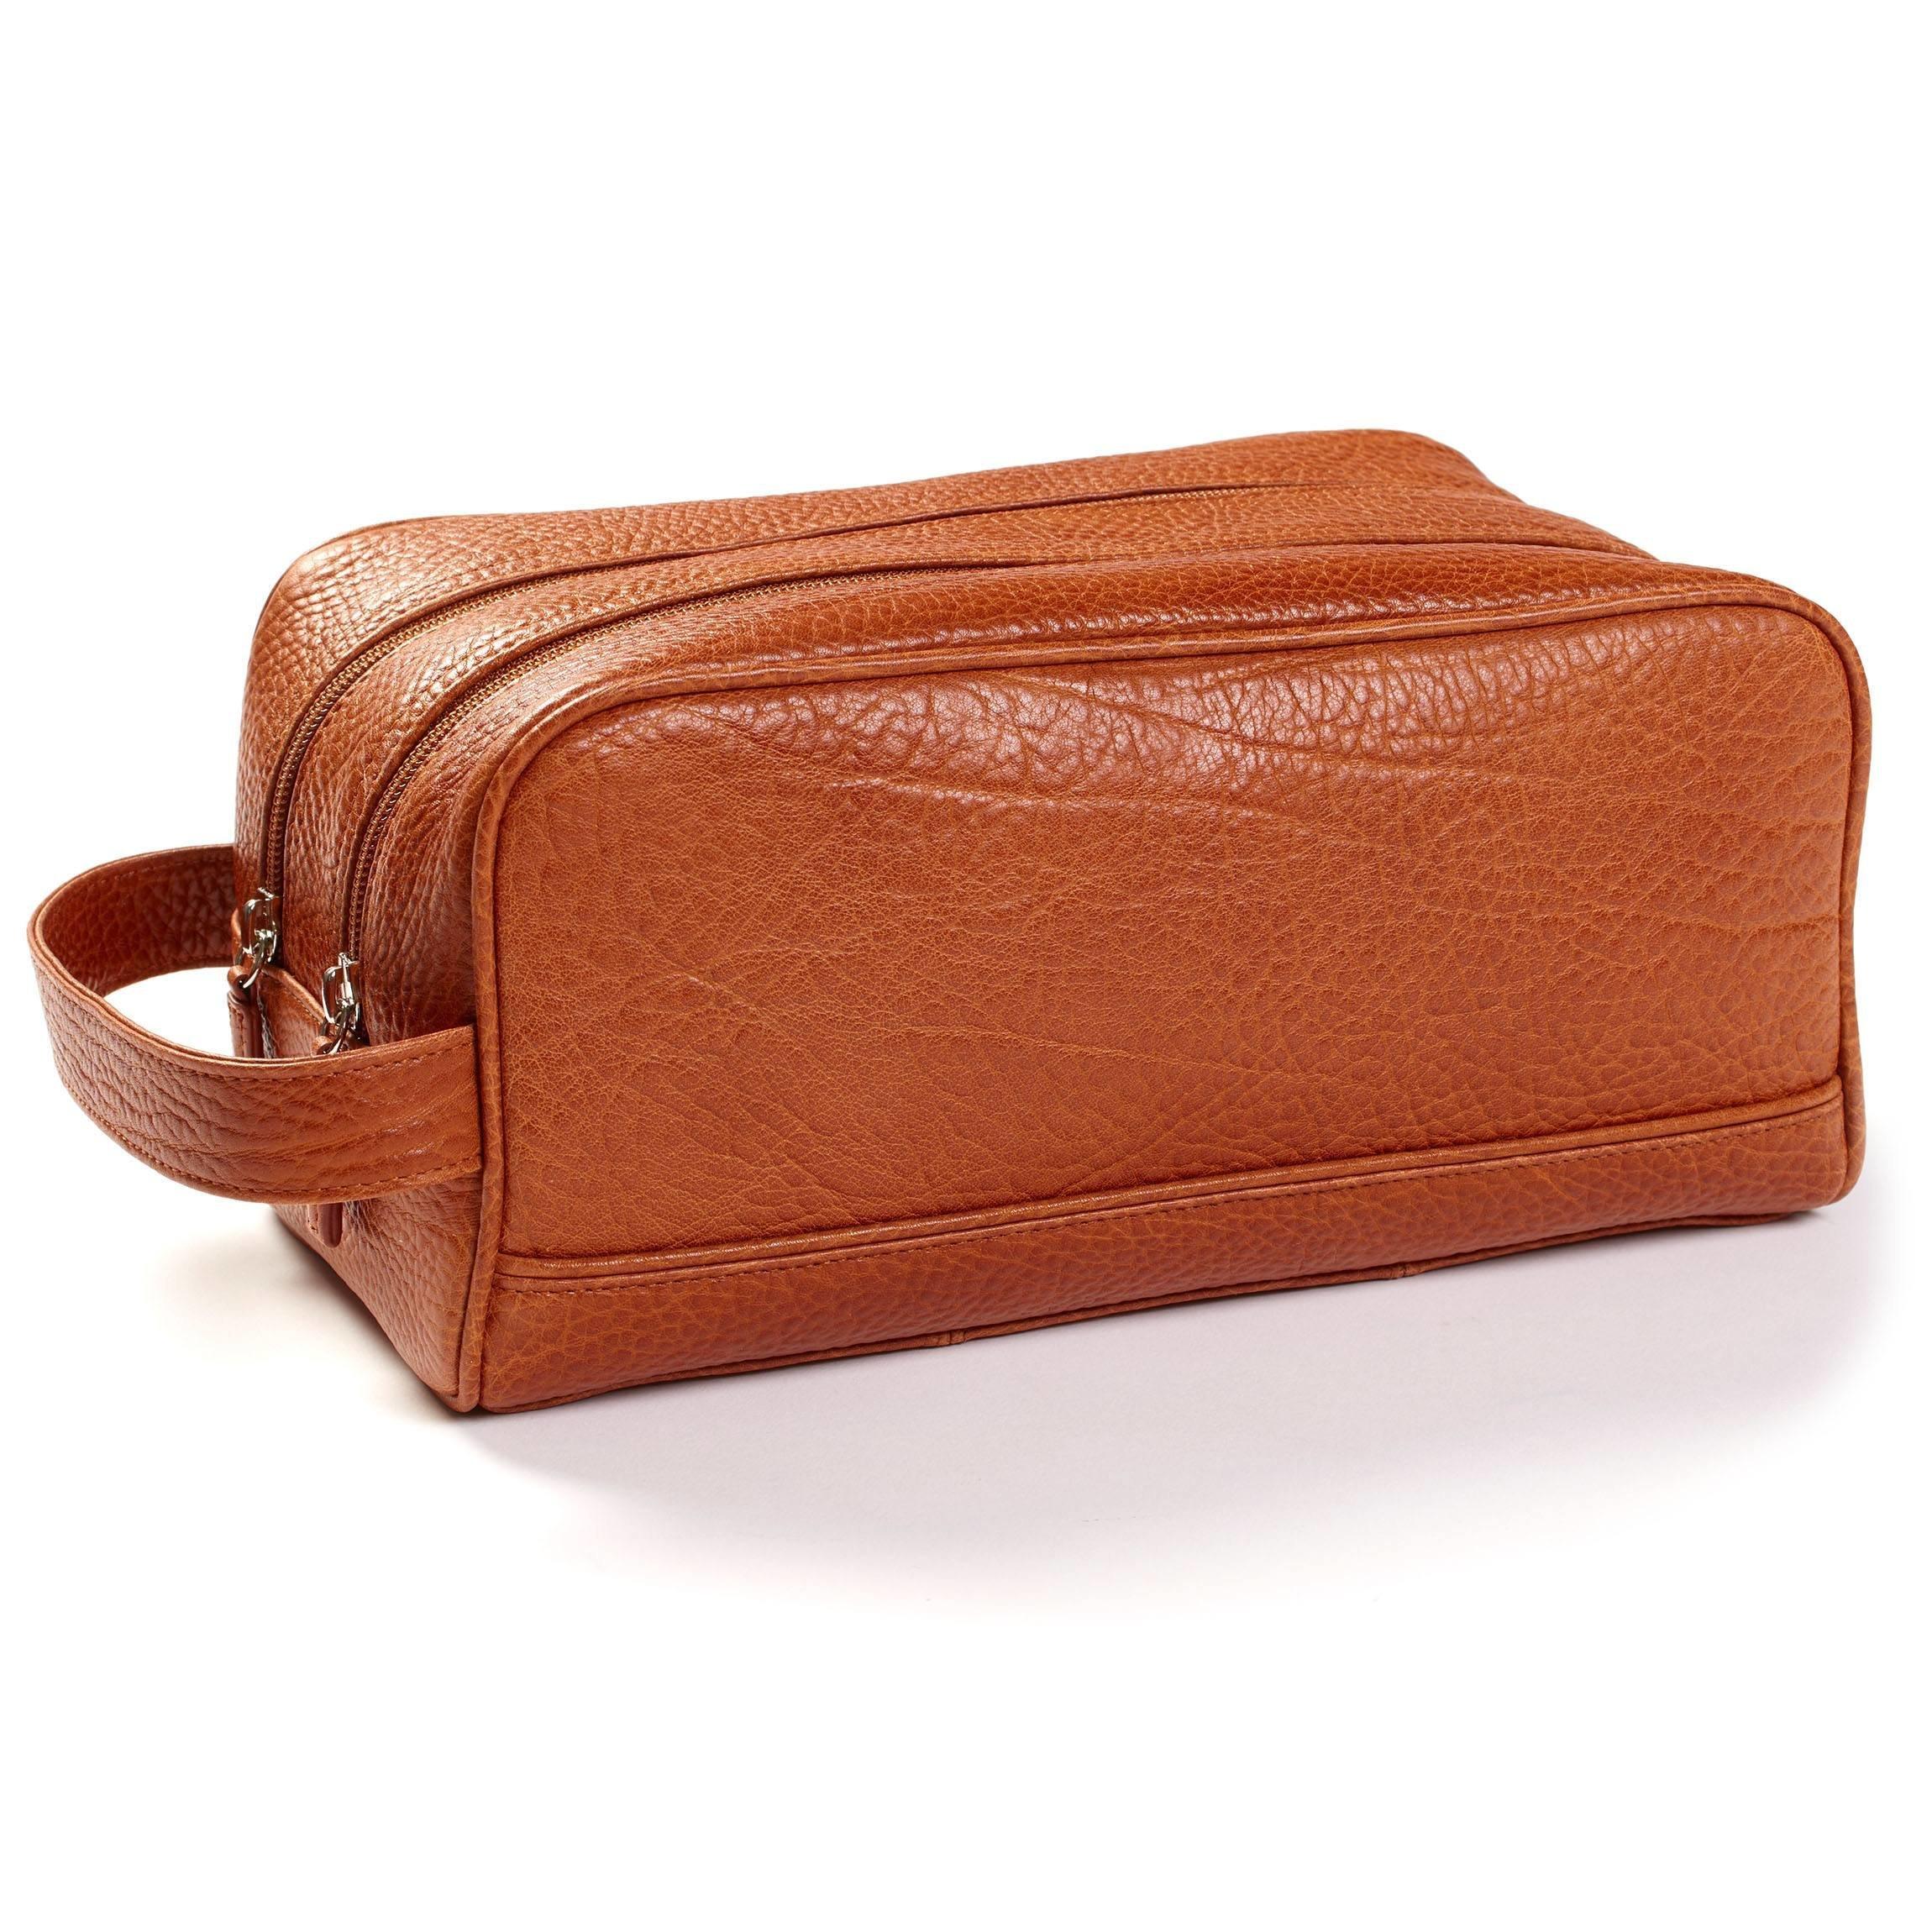 Leatherology Double Zip Toiletry Bag - Italian Leather - Whiskey (brown)